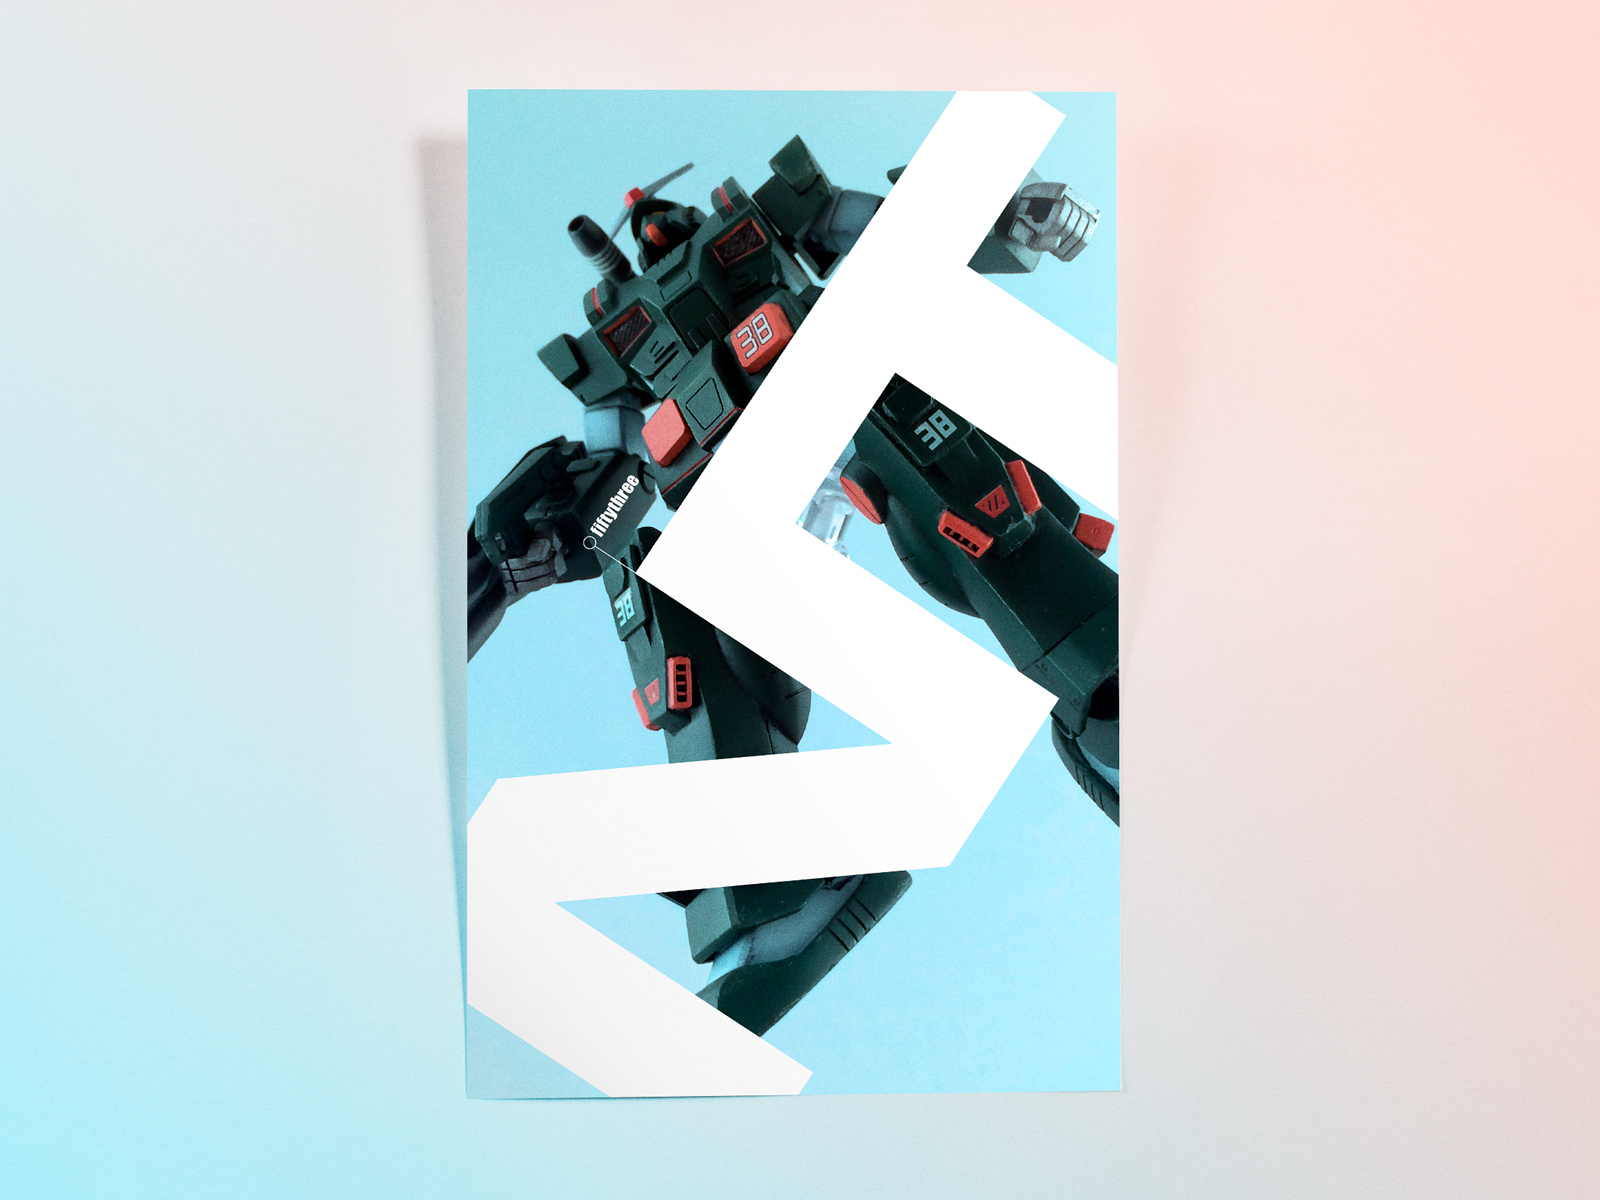 poster-3-10-19_fiftythree-web-mockup.jpg